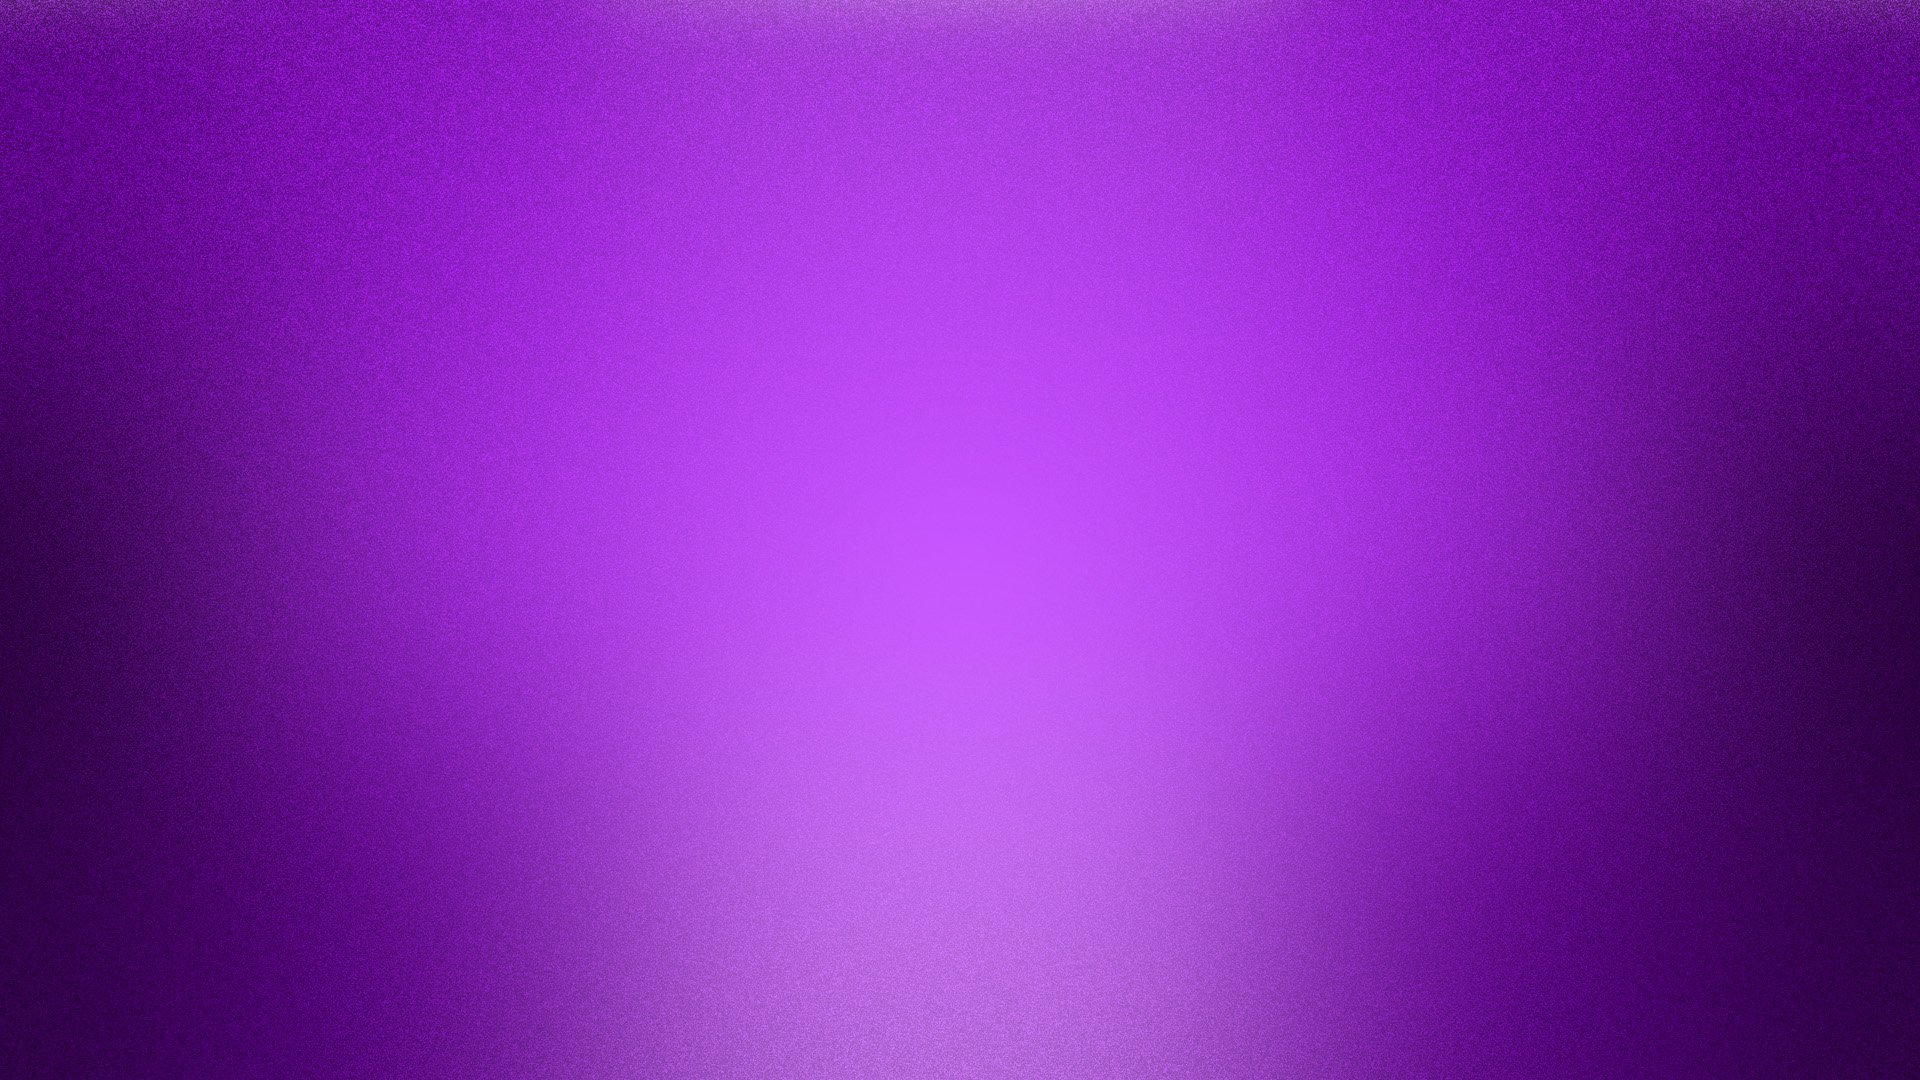 Purple wallpaper 8 1920x1080